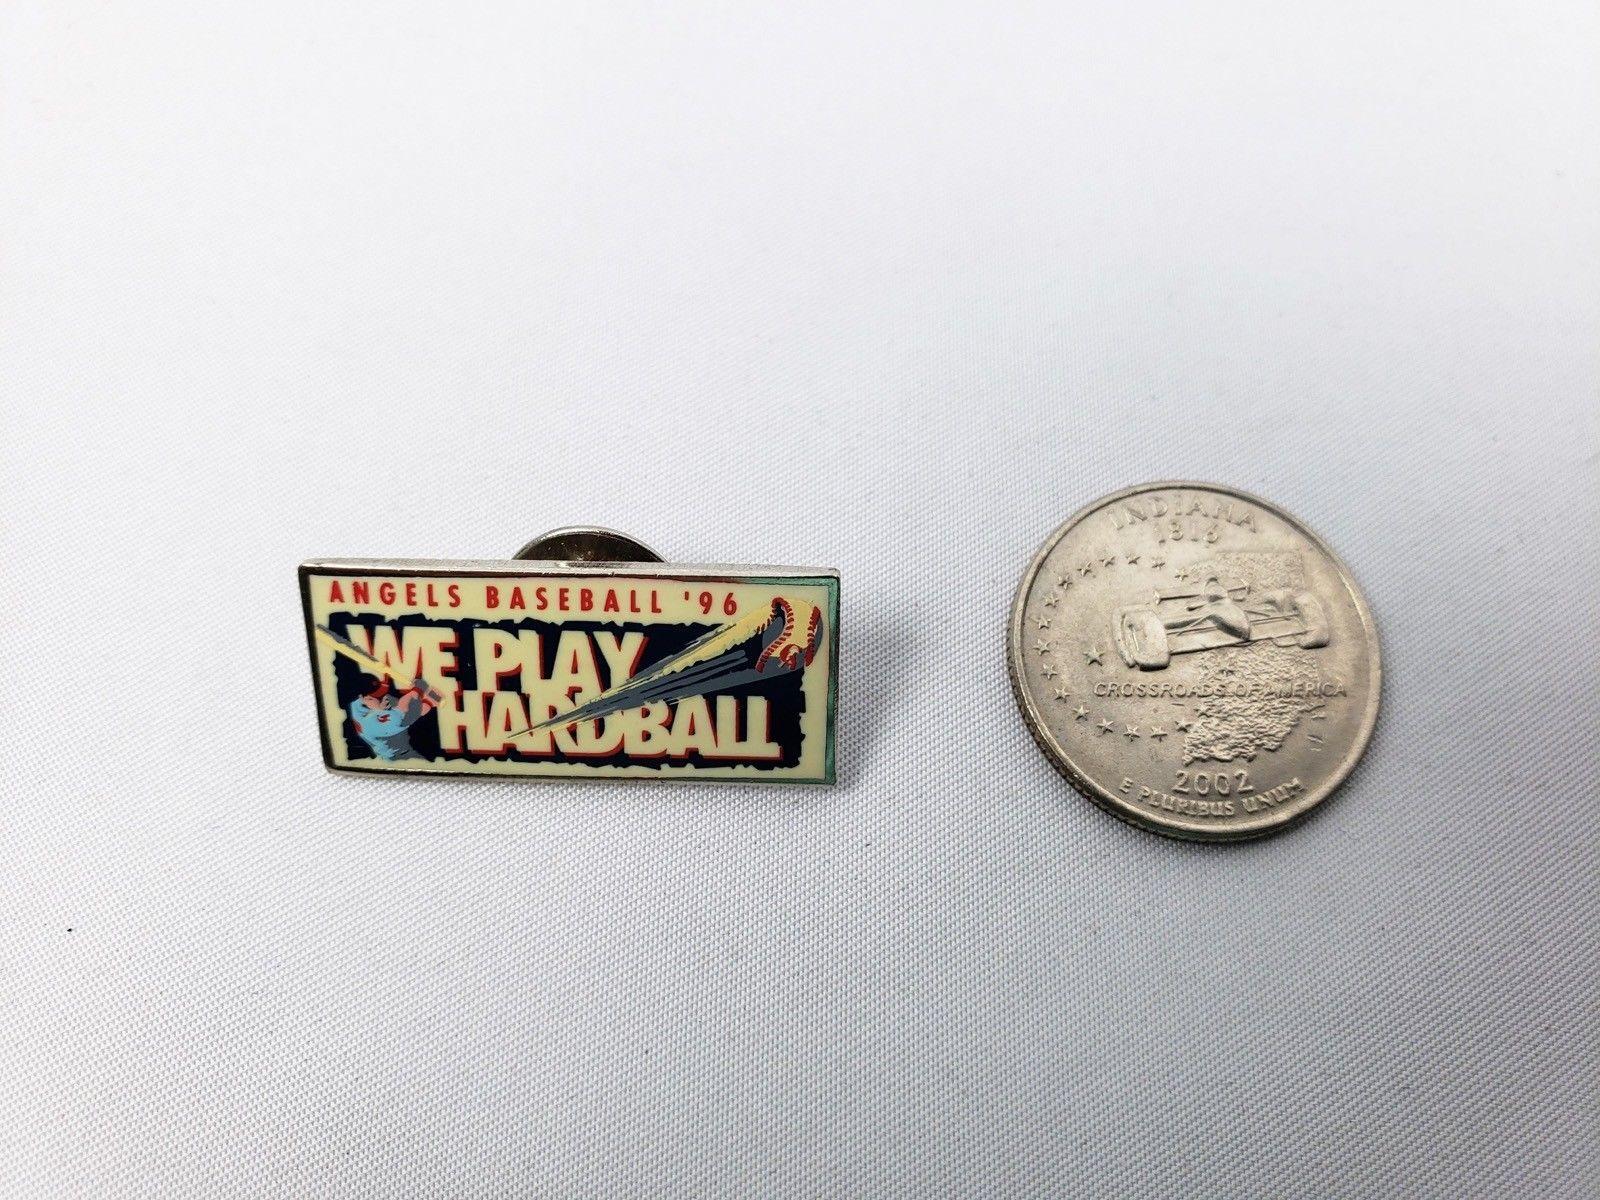 1996 Anaheim Los Angeles Angels We Play Hardball Pin Lapel Staff Exclusive MLB